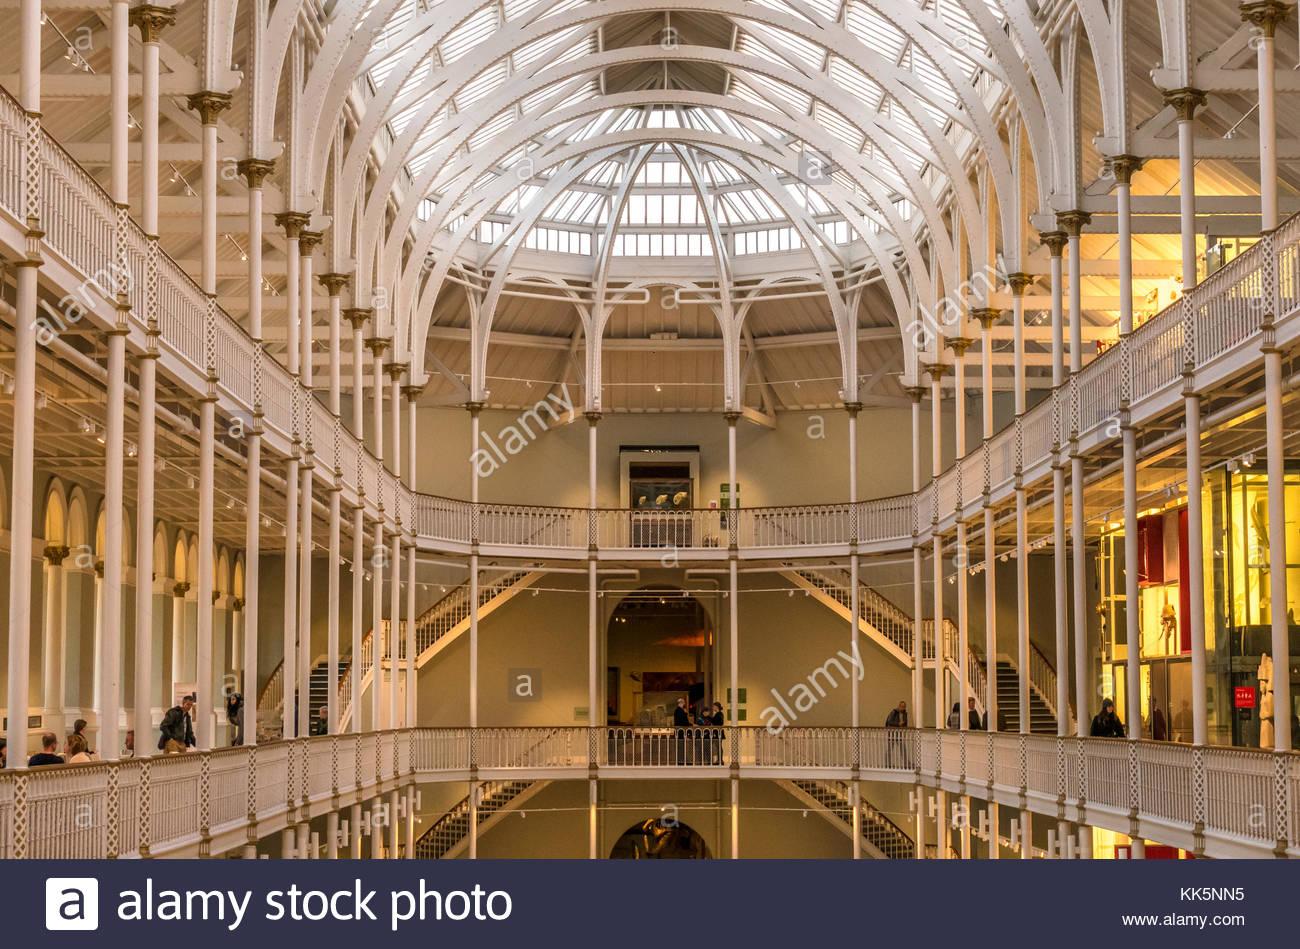 three-tiers-of-ornate-metal-balconied-st